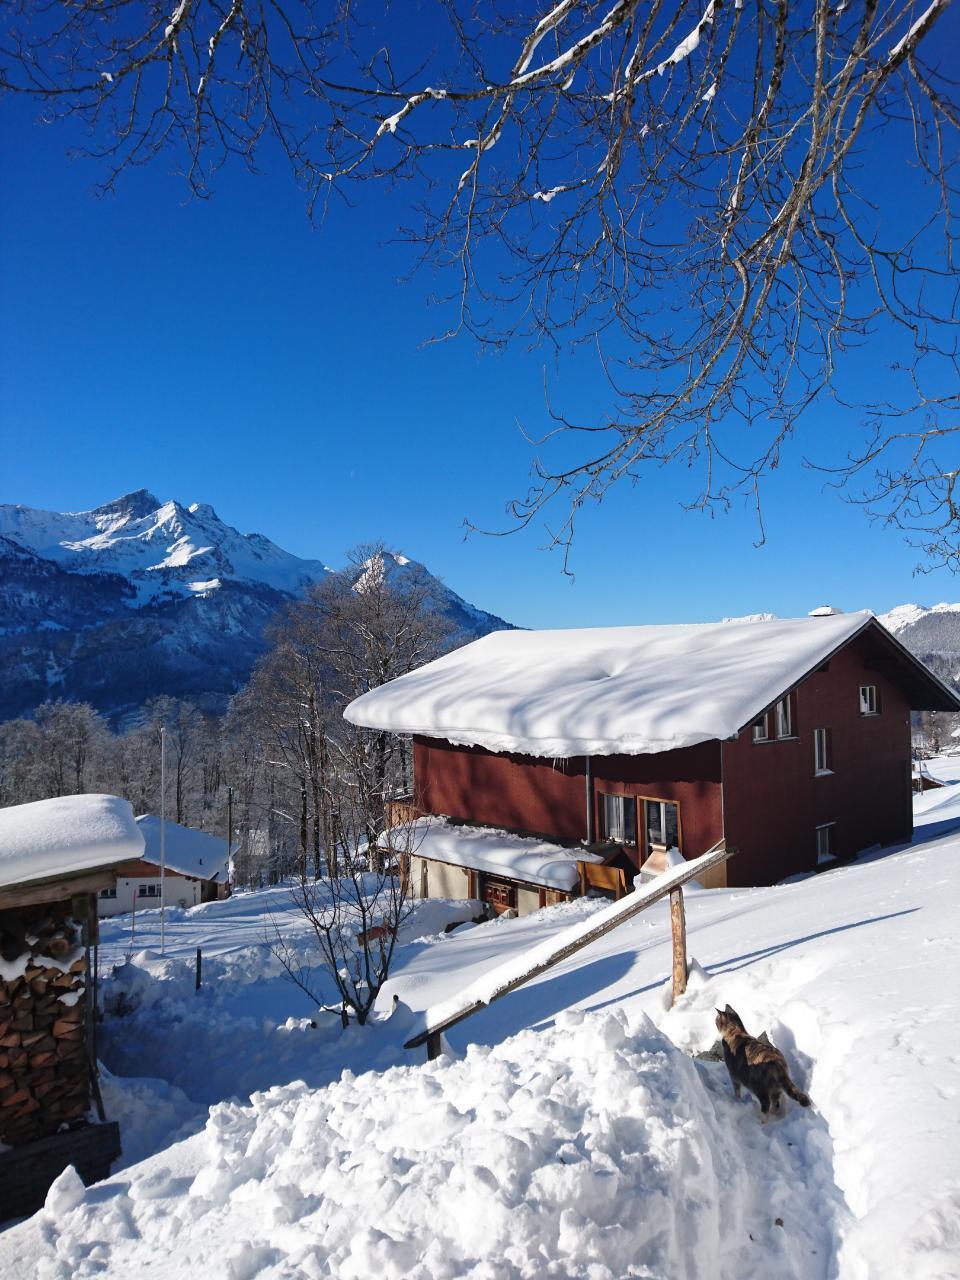 Ferienwohnung Obererli 4-Bettwohnung (2692316), Hasliberg Hohfluh, Meiringen - Hasliberg, Berner Oberland, Schweiz, Bild 20